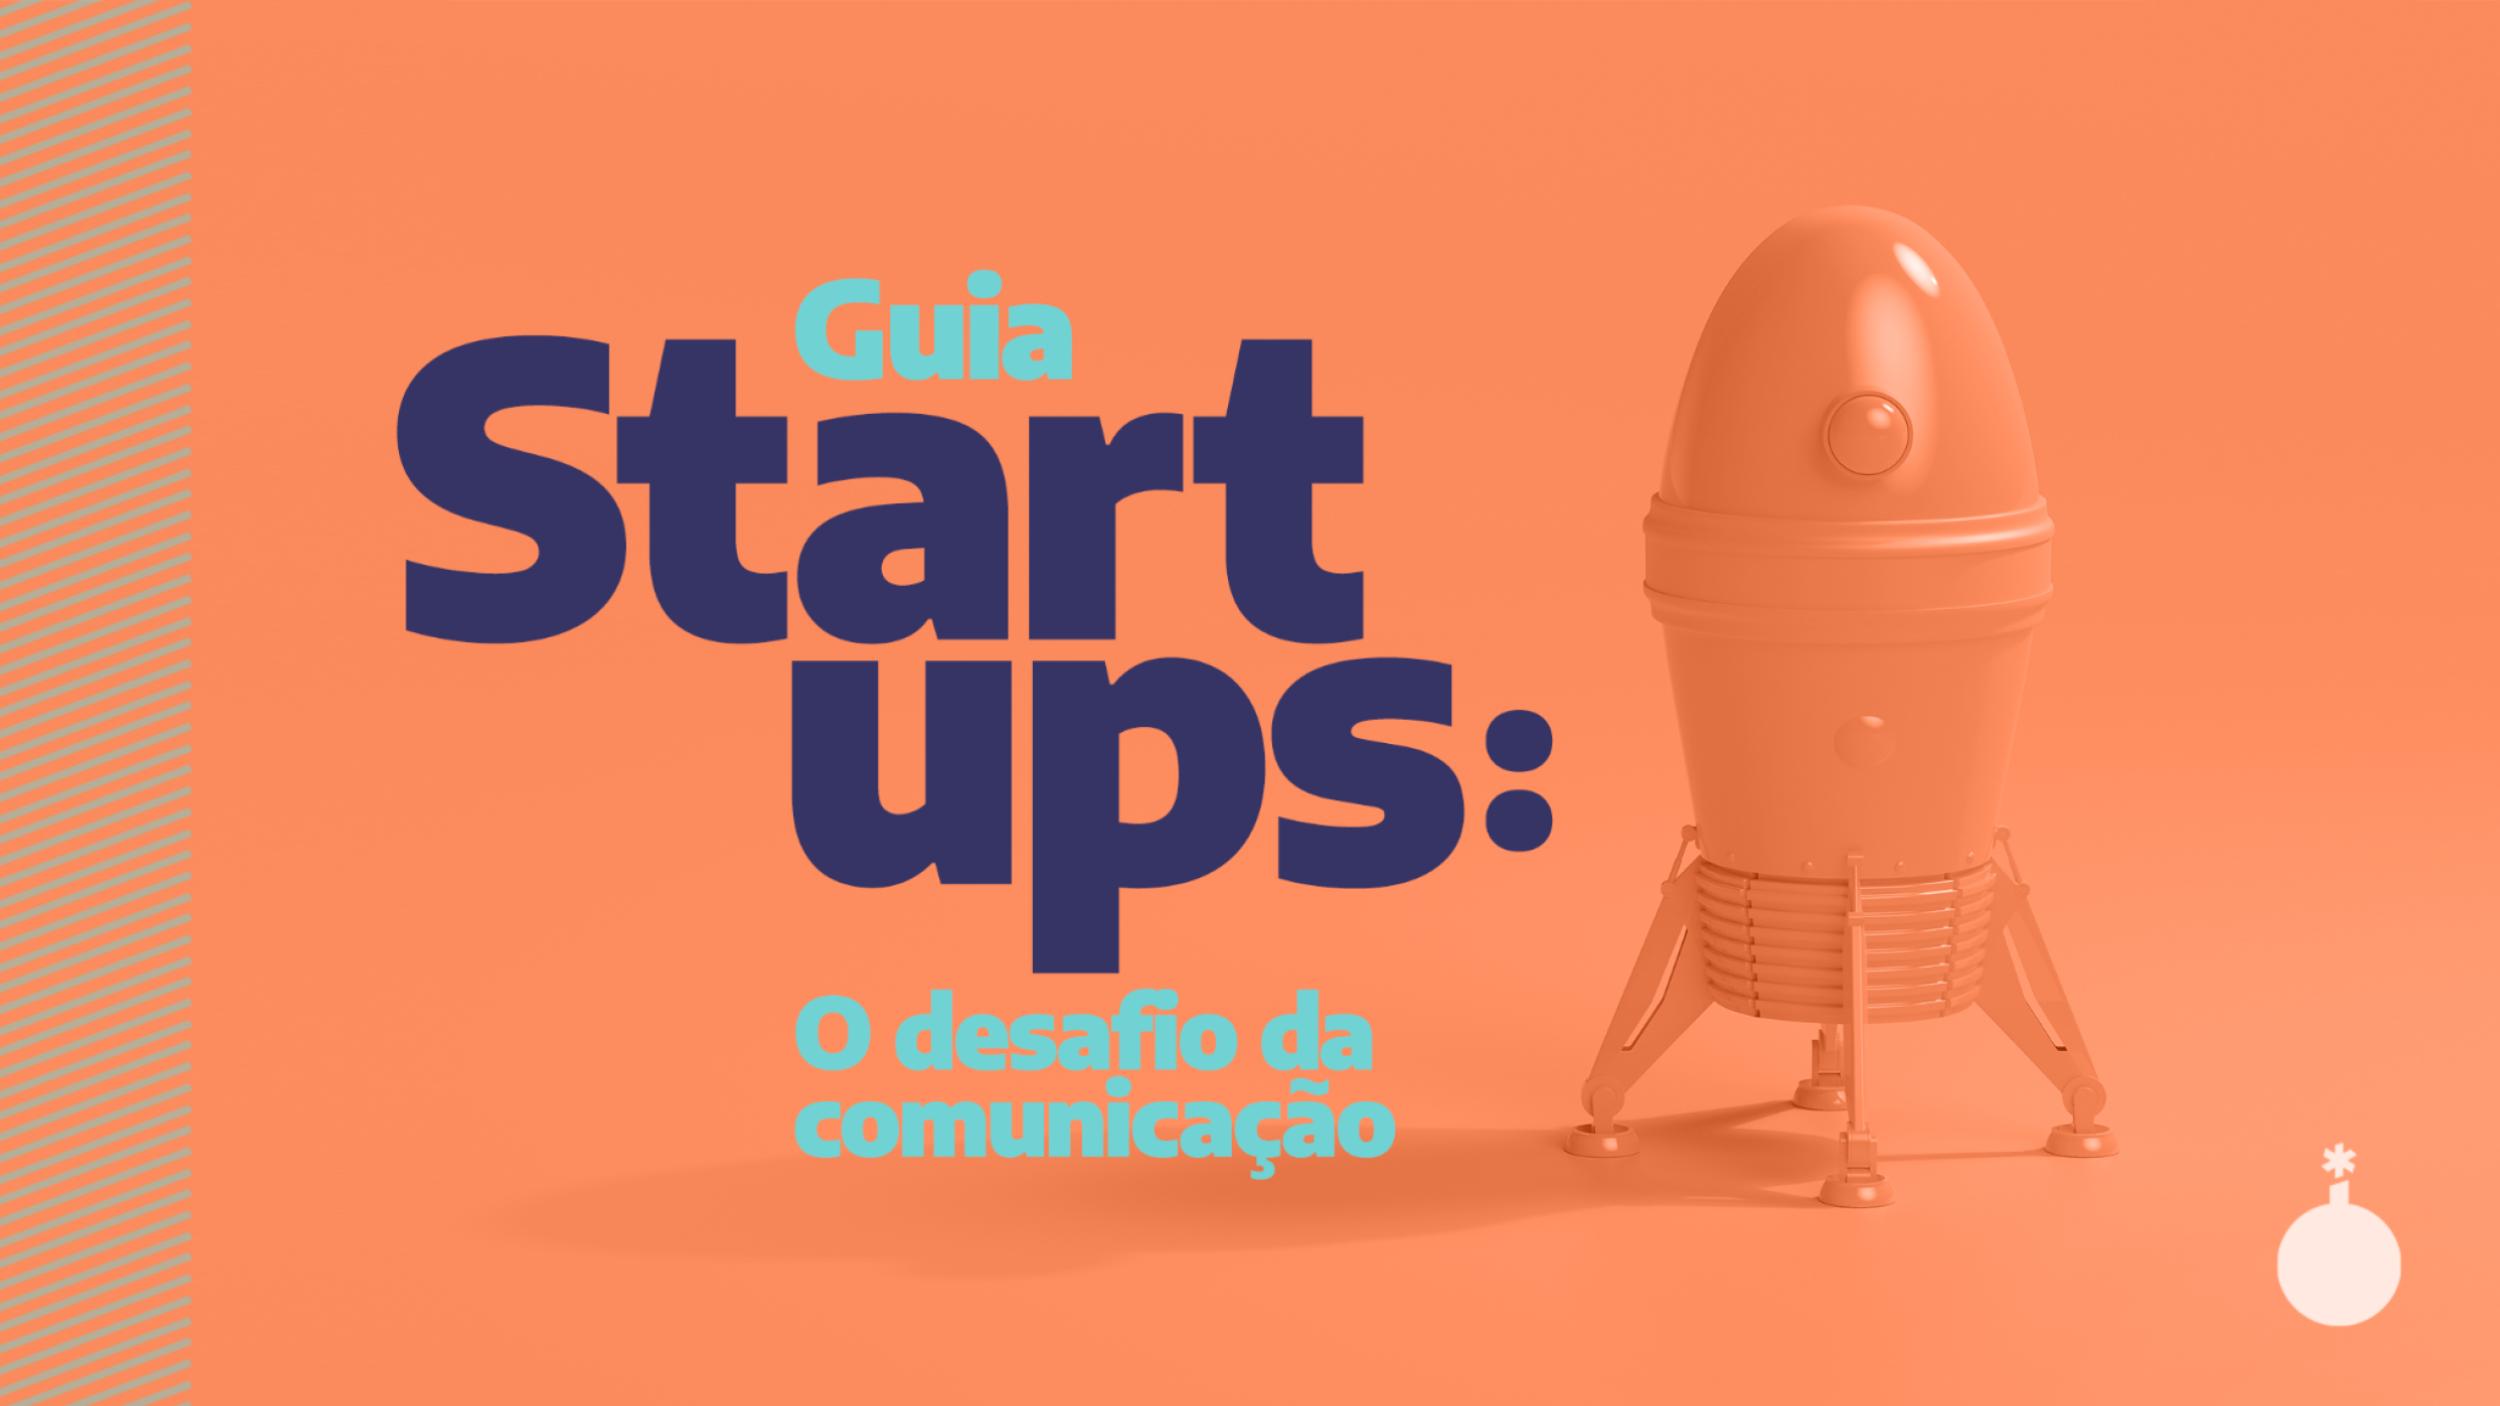 Guia Startups